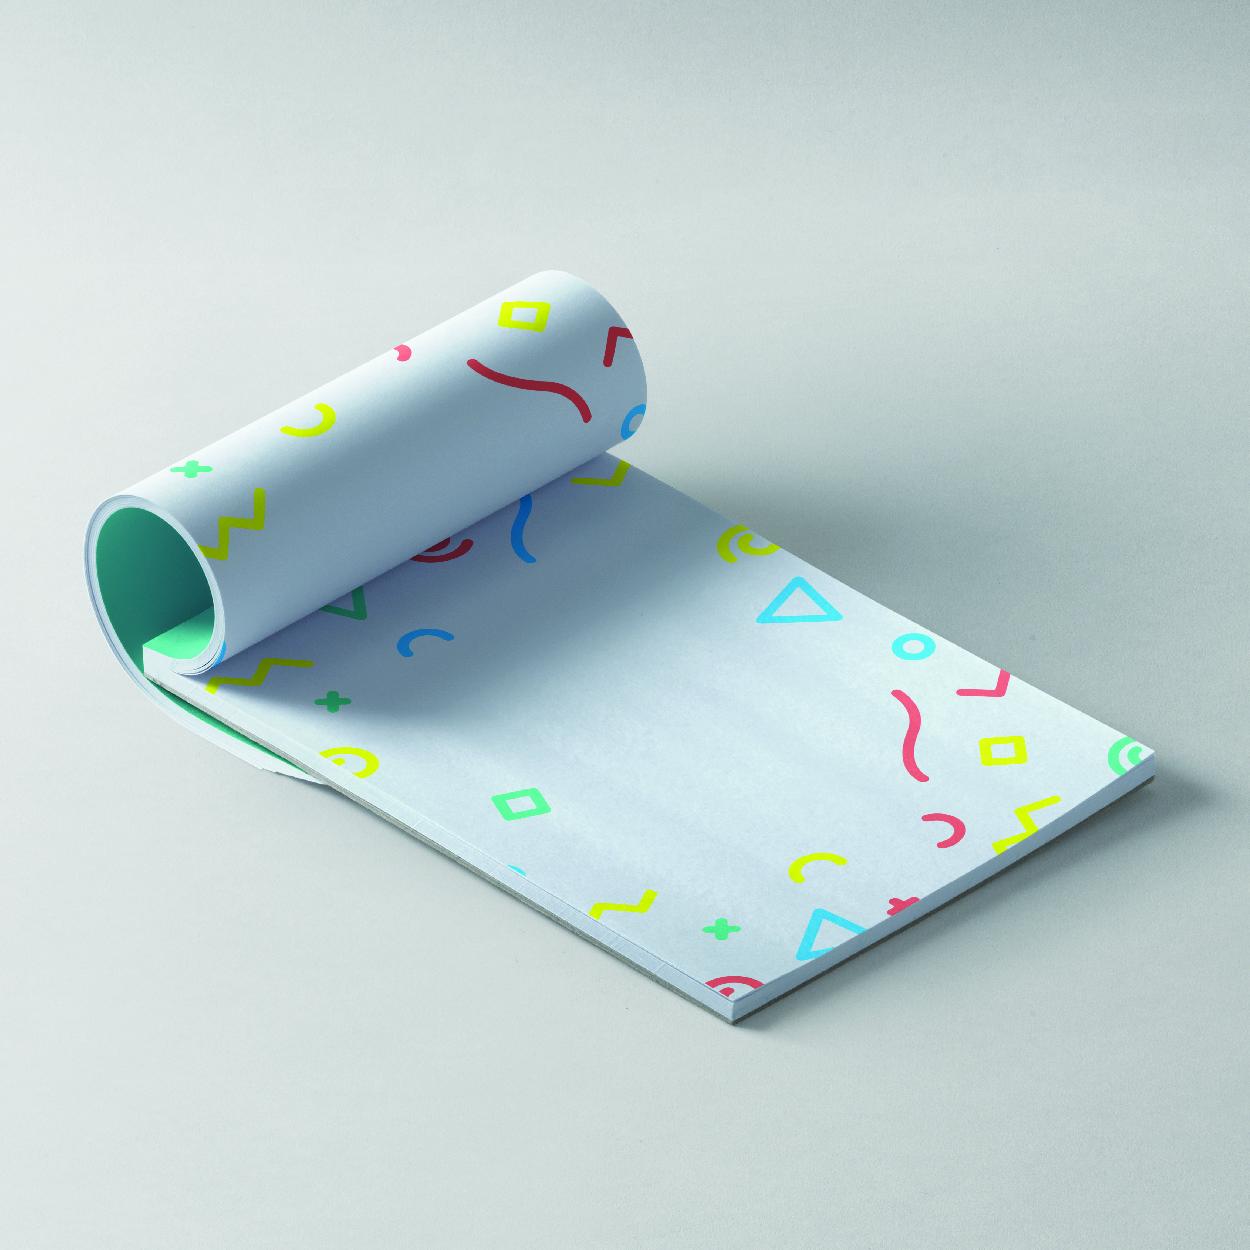 http://shop.copycatprint.com.au/images/products_gallery_images/COPYCAT_WEB_GLUE_PADS_PRODUCTS_JAN18_Artboard_7.jpg